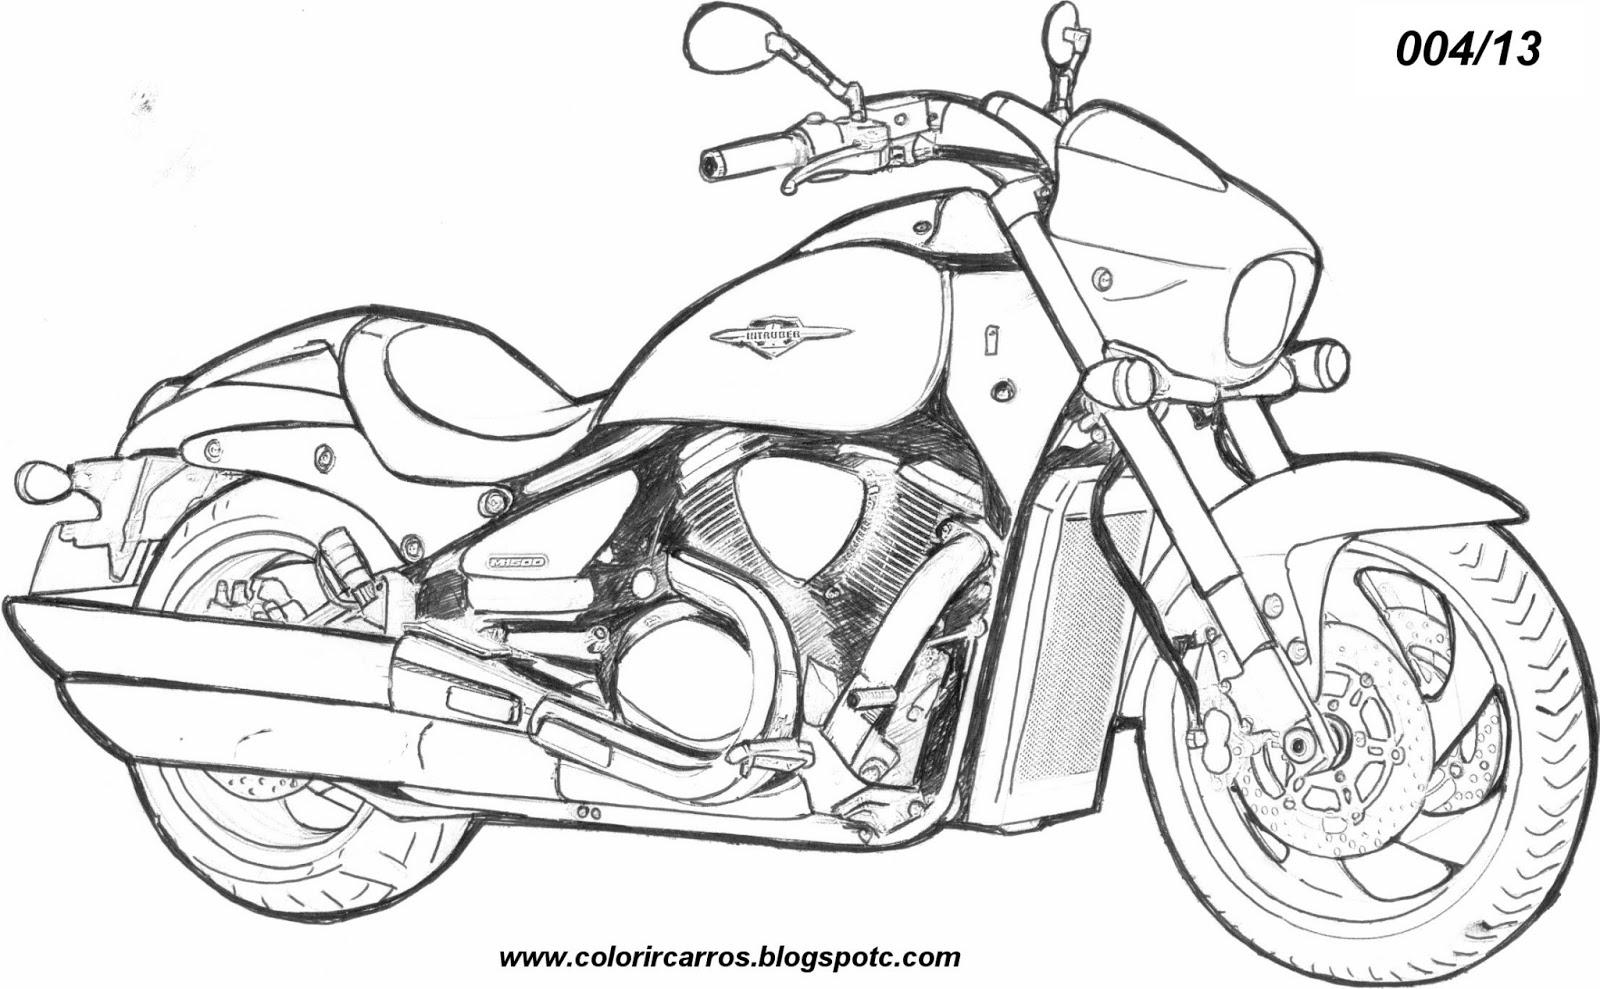 Harley Davidson De 3 De 4 Def Dec Electric Golf Cart